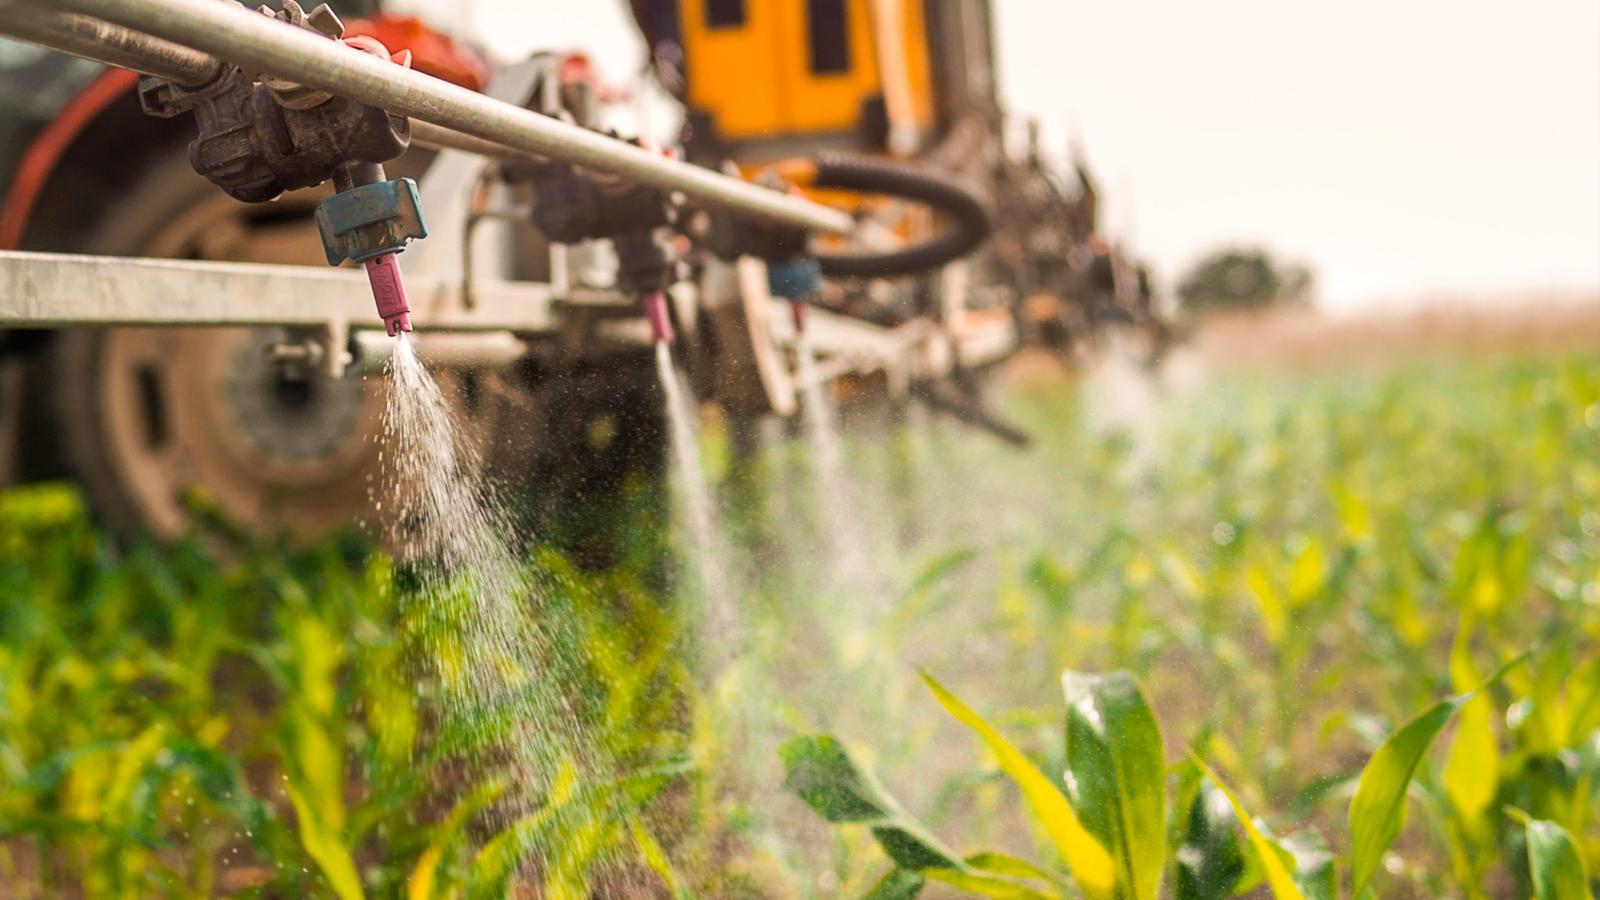 Anvisa proíbe agrotóxicos com Paraquat no Brasil